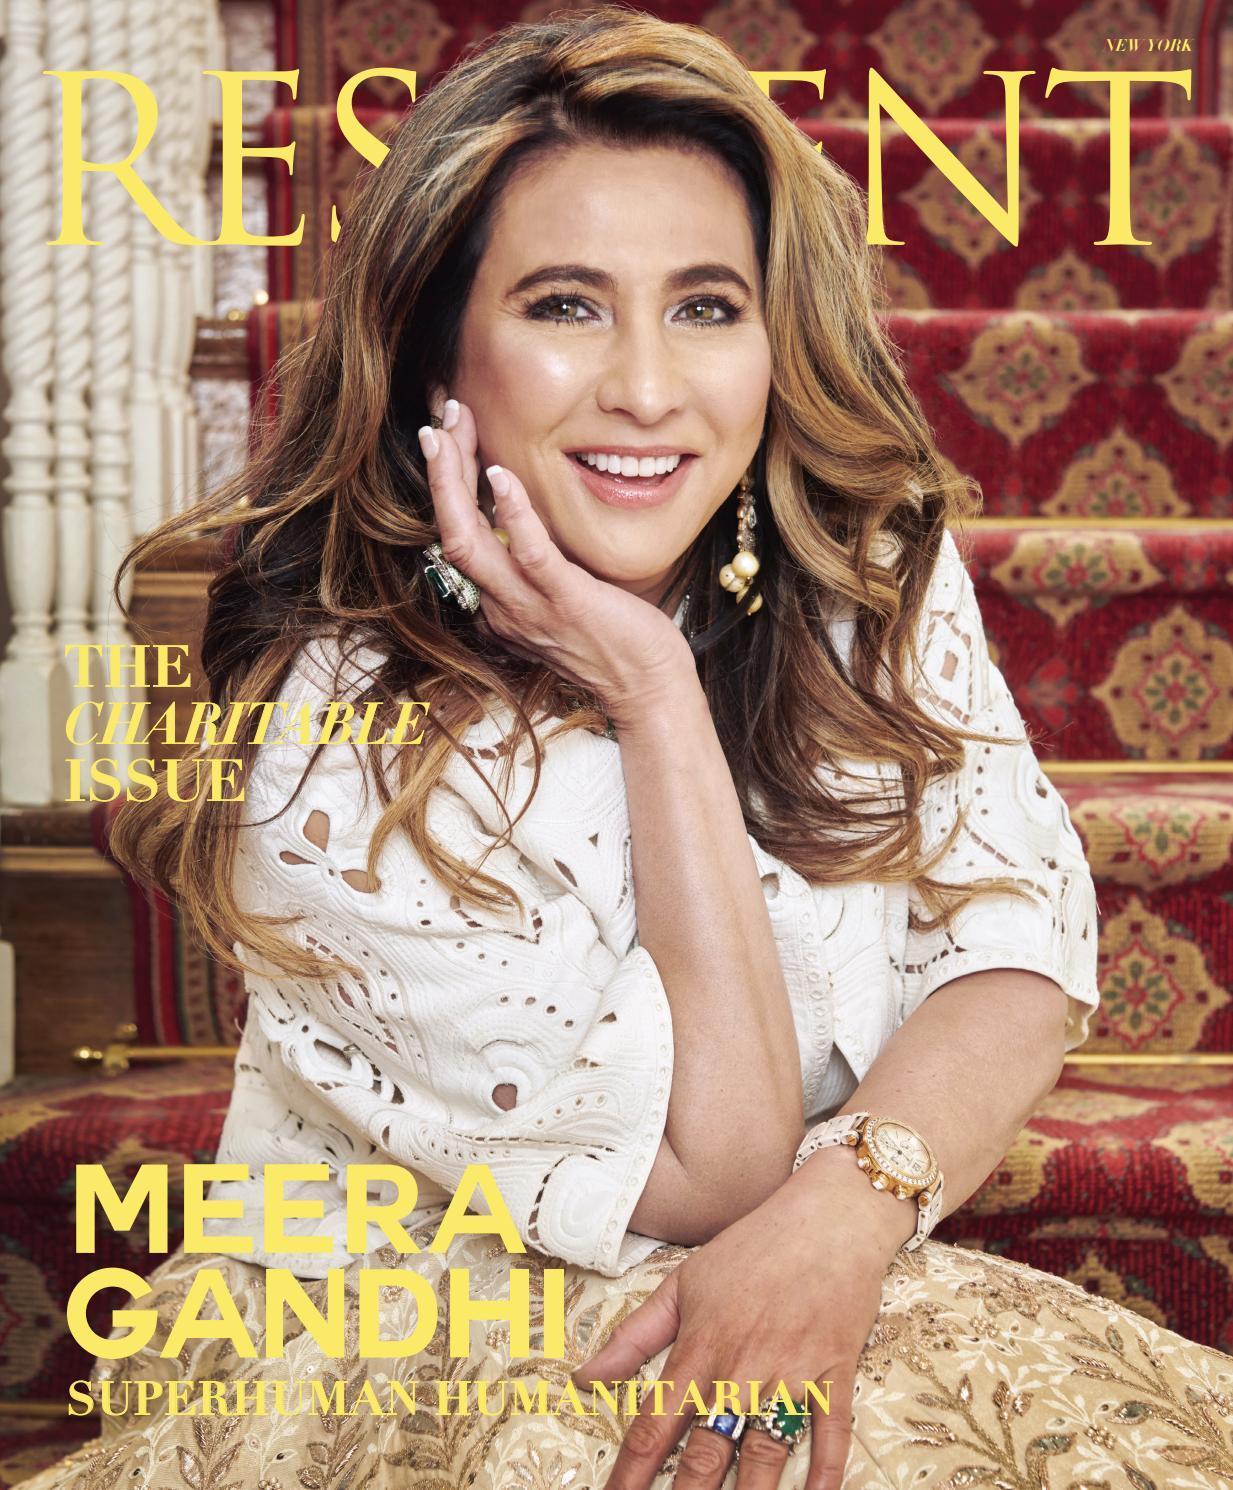 234233e0c27 Resident Magazine NY APRIL 2019 MEERA GANDHI by Resident Magazine - issuu